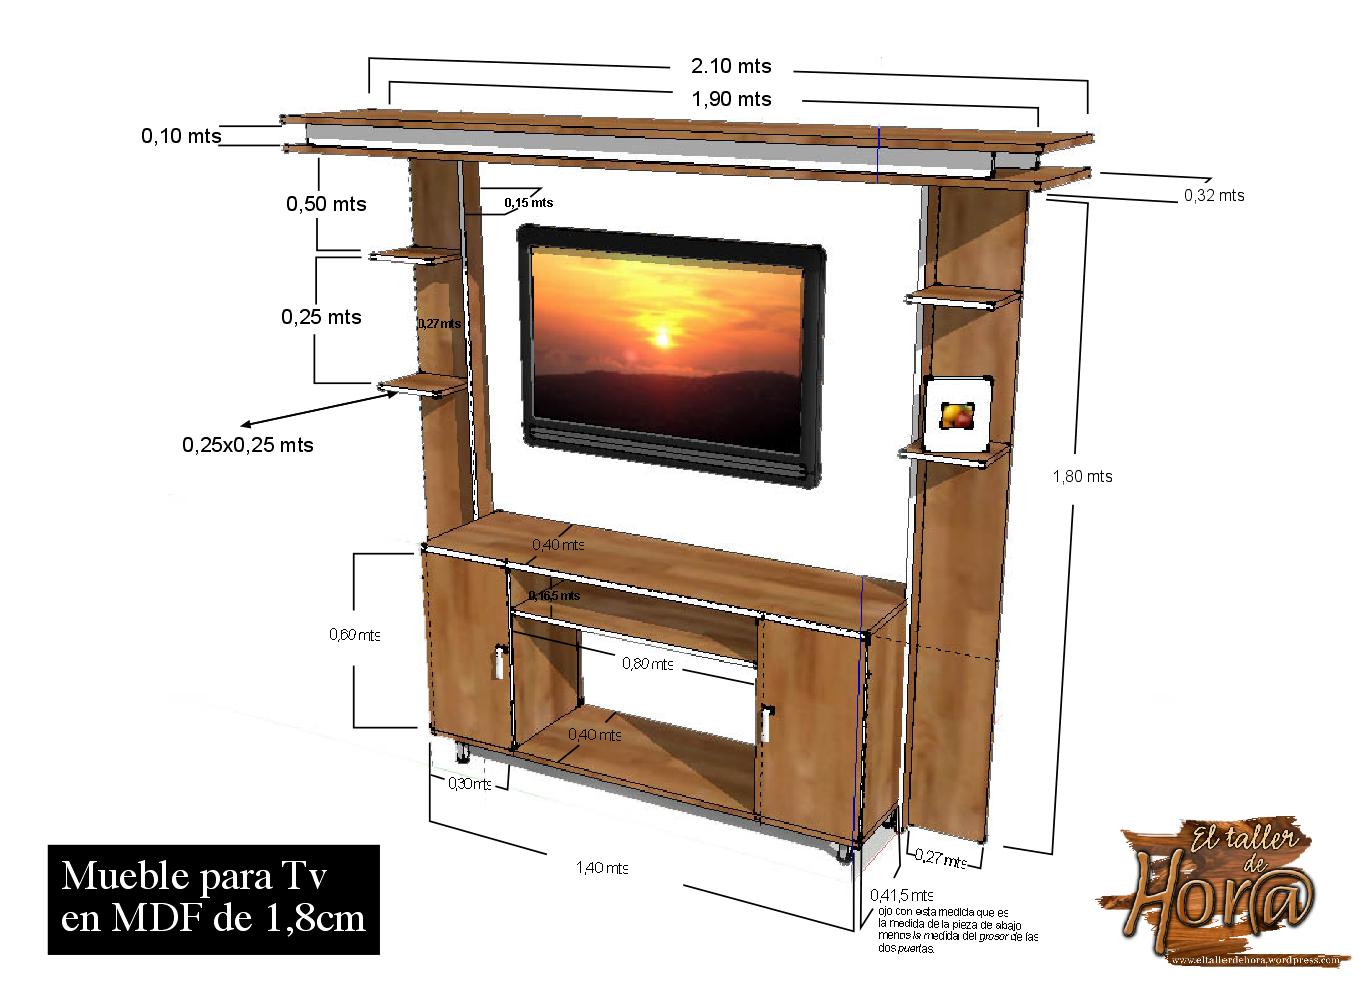 Planos de muebles de cocina en melamina gratis azarak for Planos para muebles de cocina en melamina